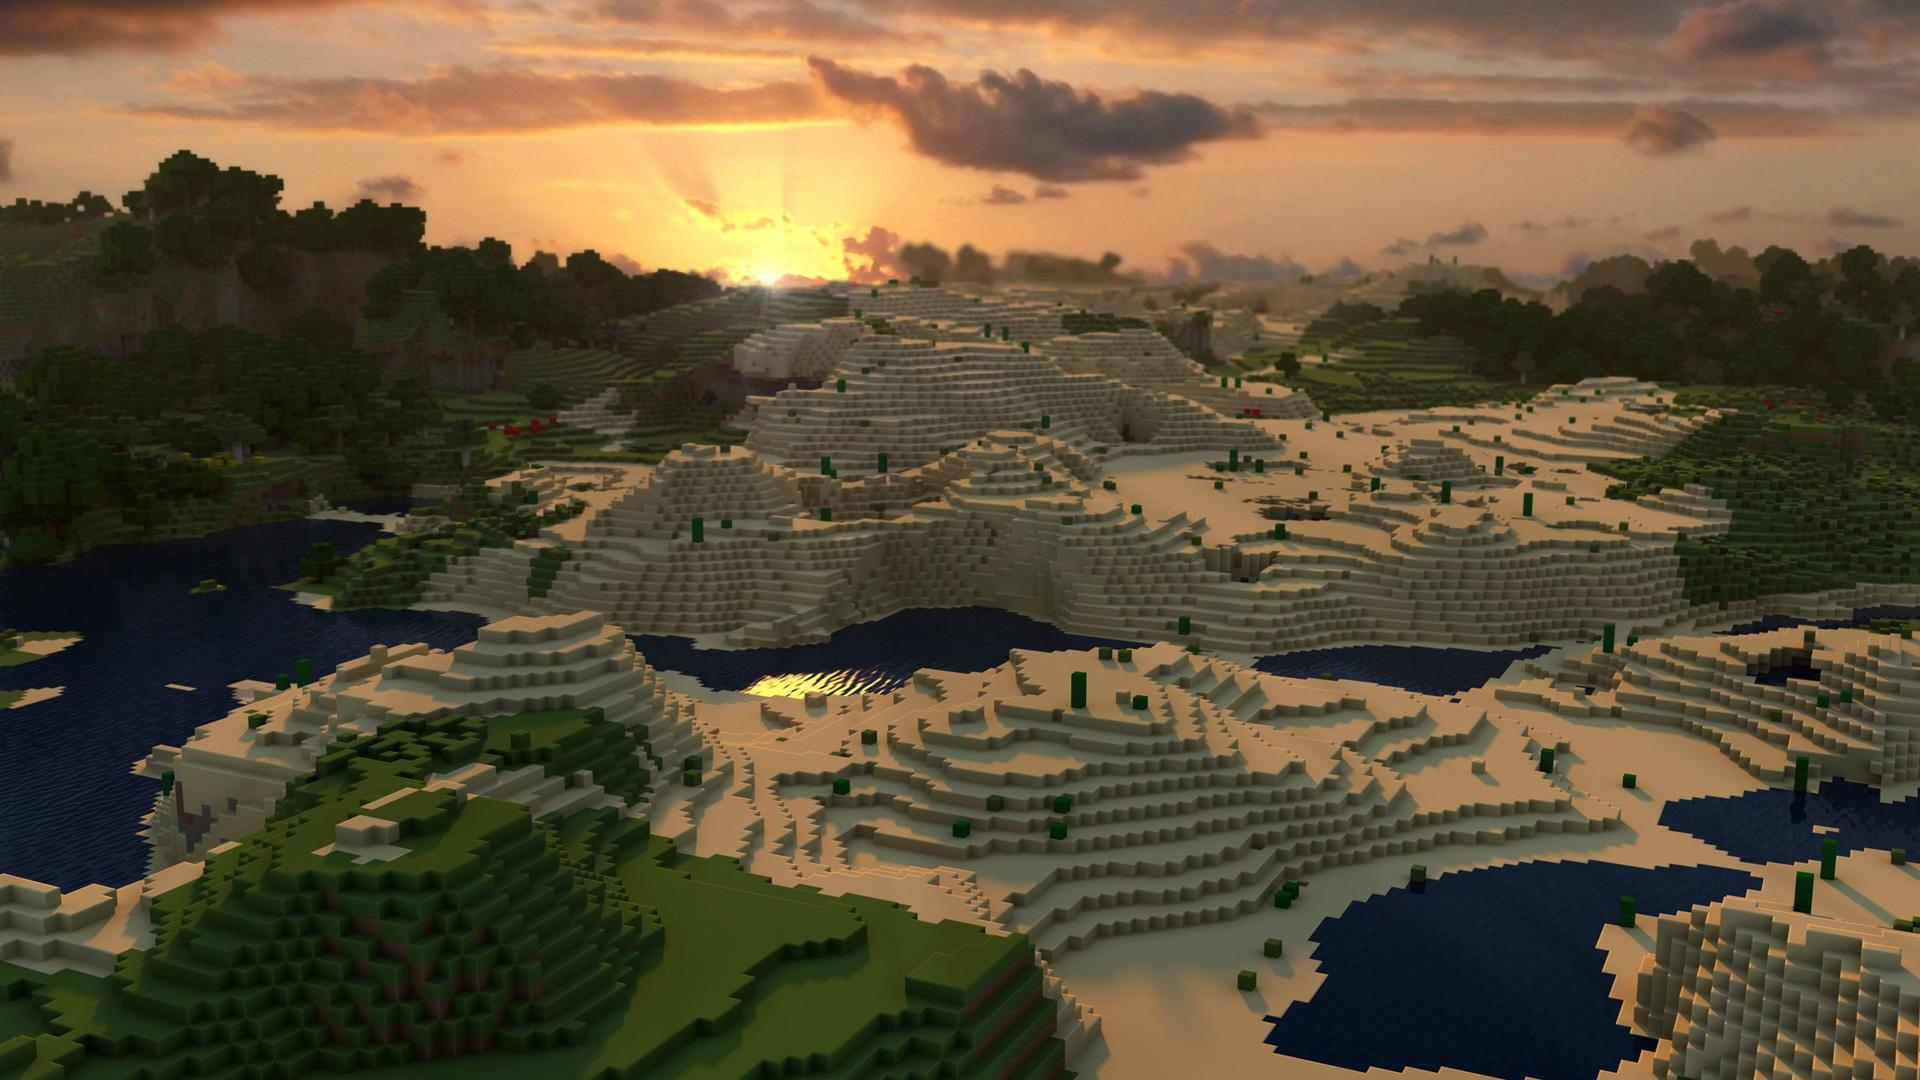 44 1080p Minecraft Wallpaper On Wallpapersafari